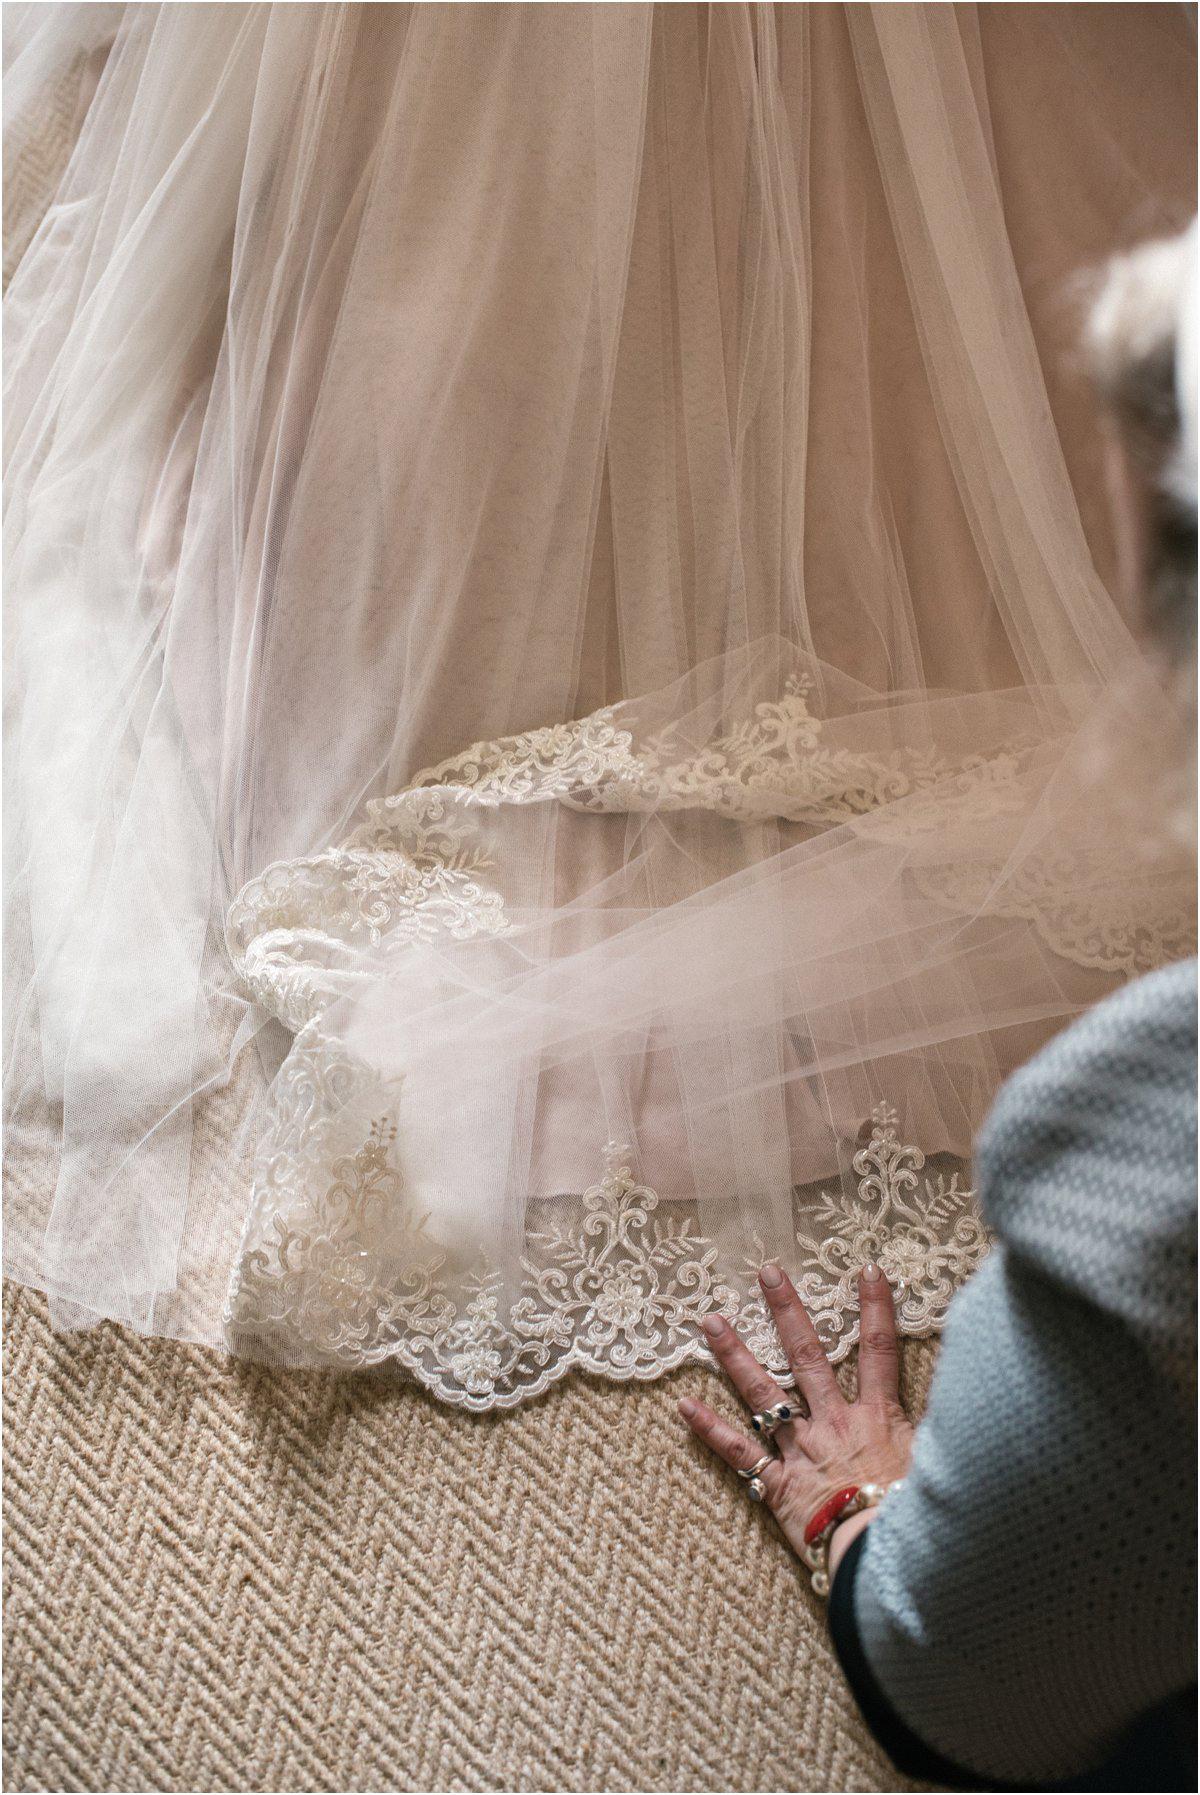 Crofts&Kowalczyk_DundasCastle_WeddingPhotography_Hannah&Tom-22.jpg